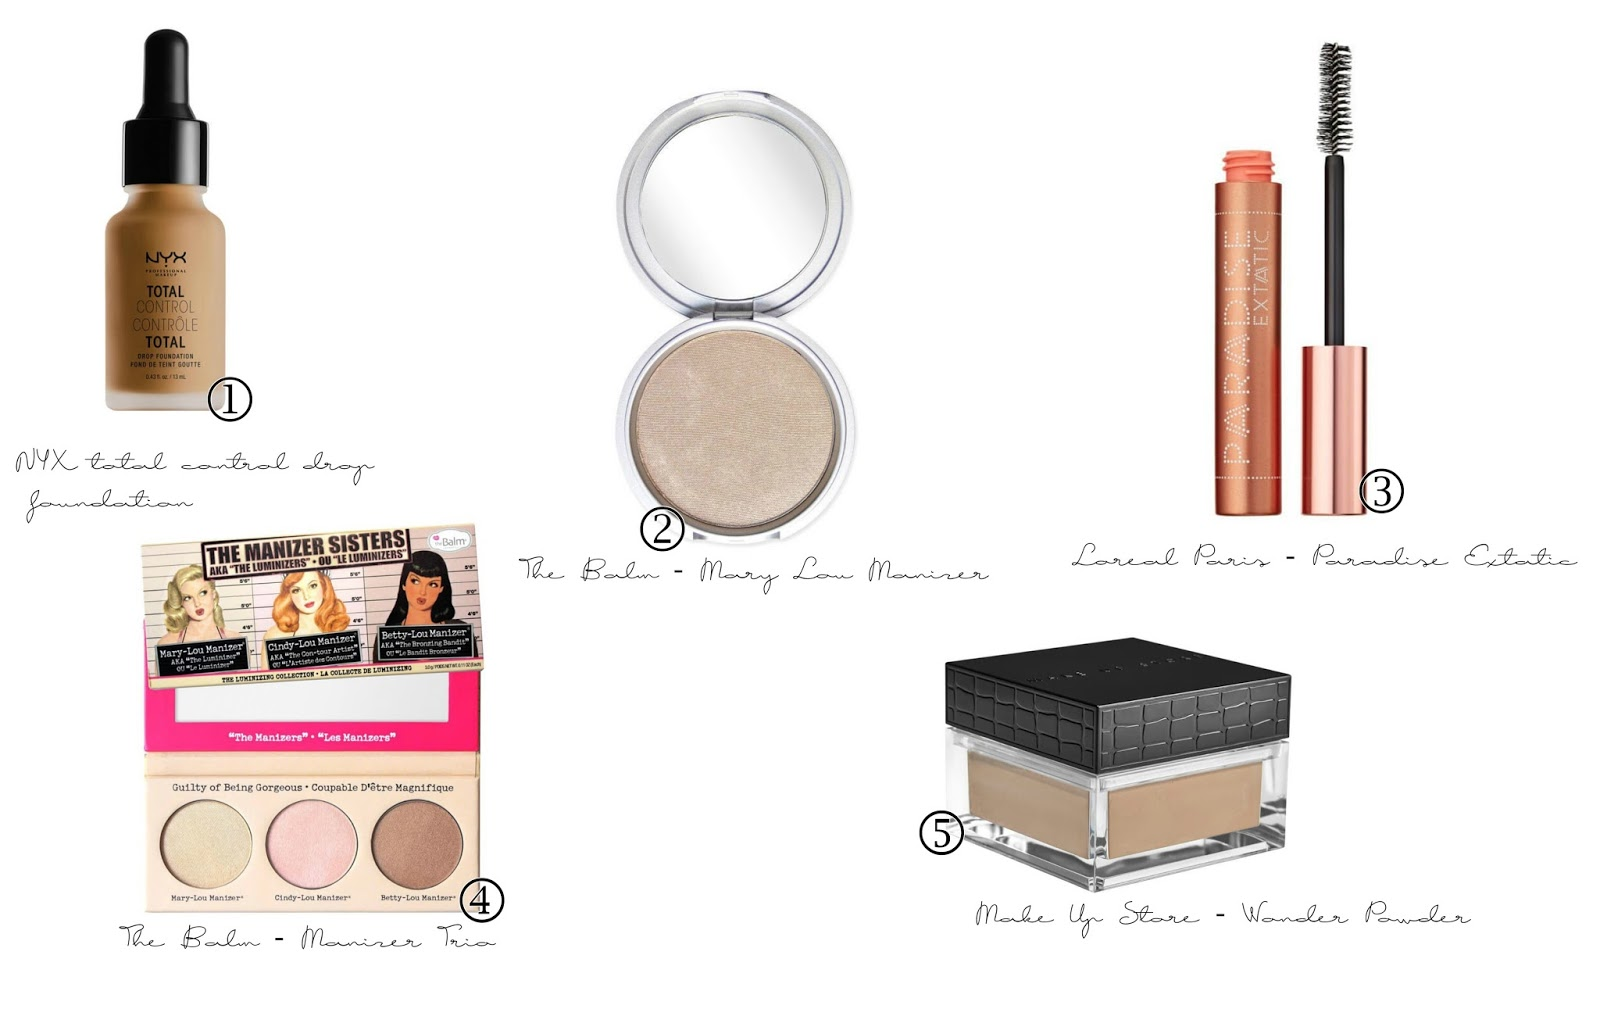 nyx loreal thebalm mascara foundation